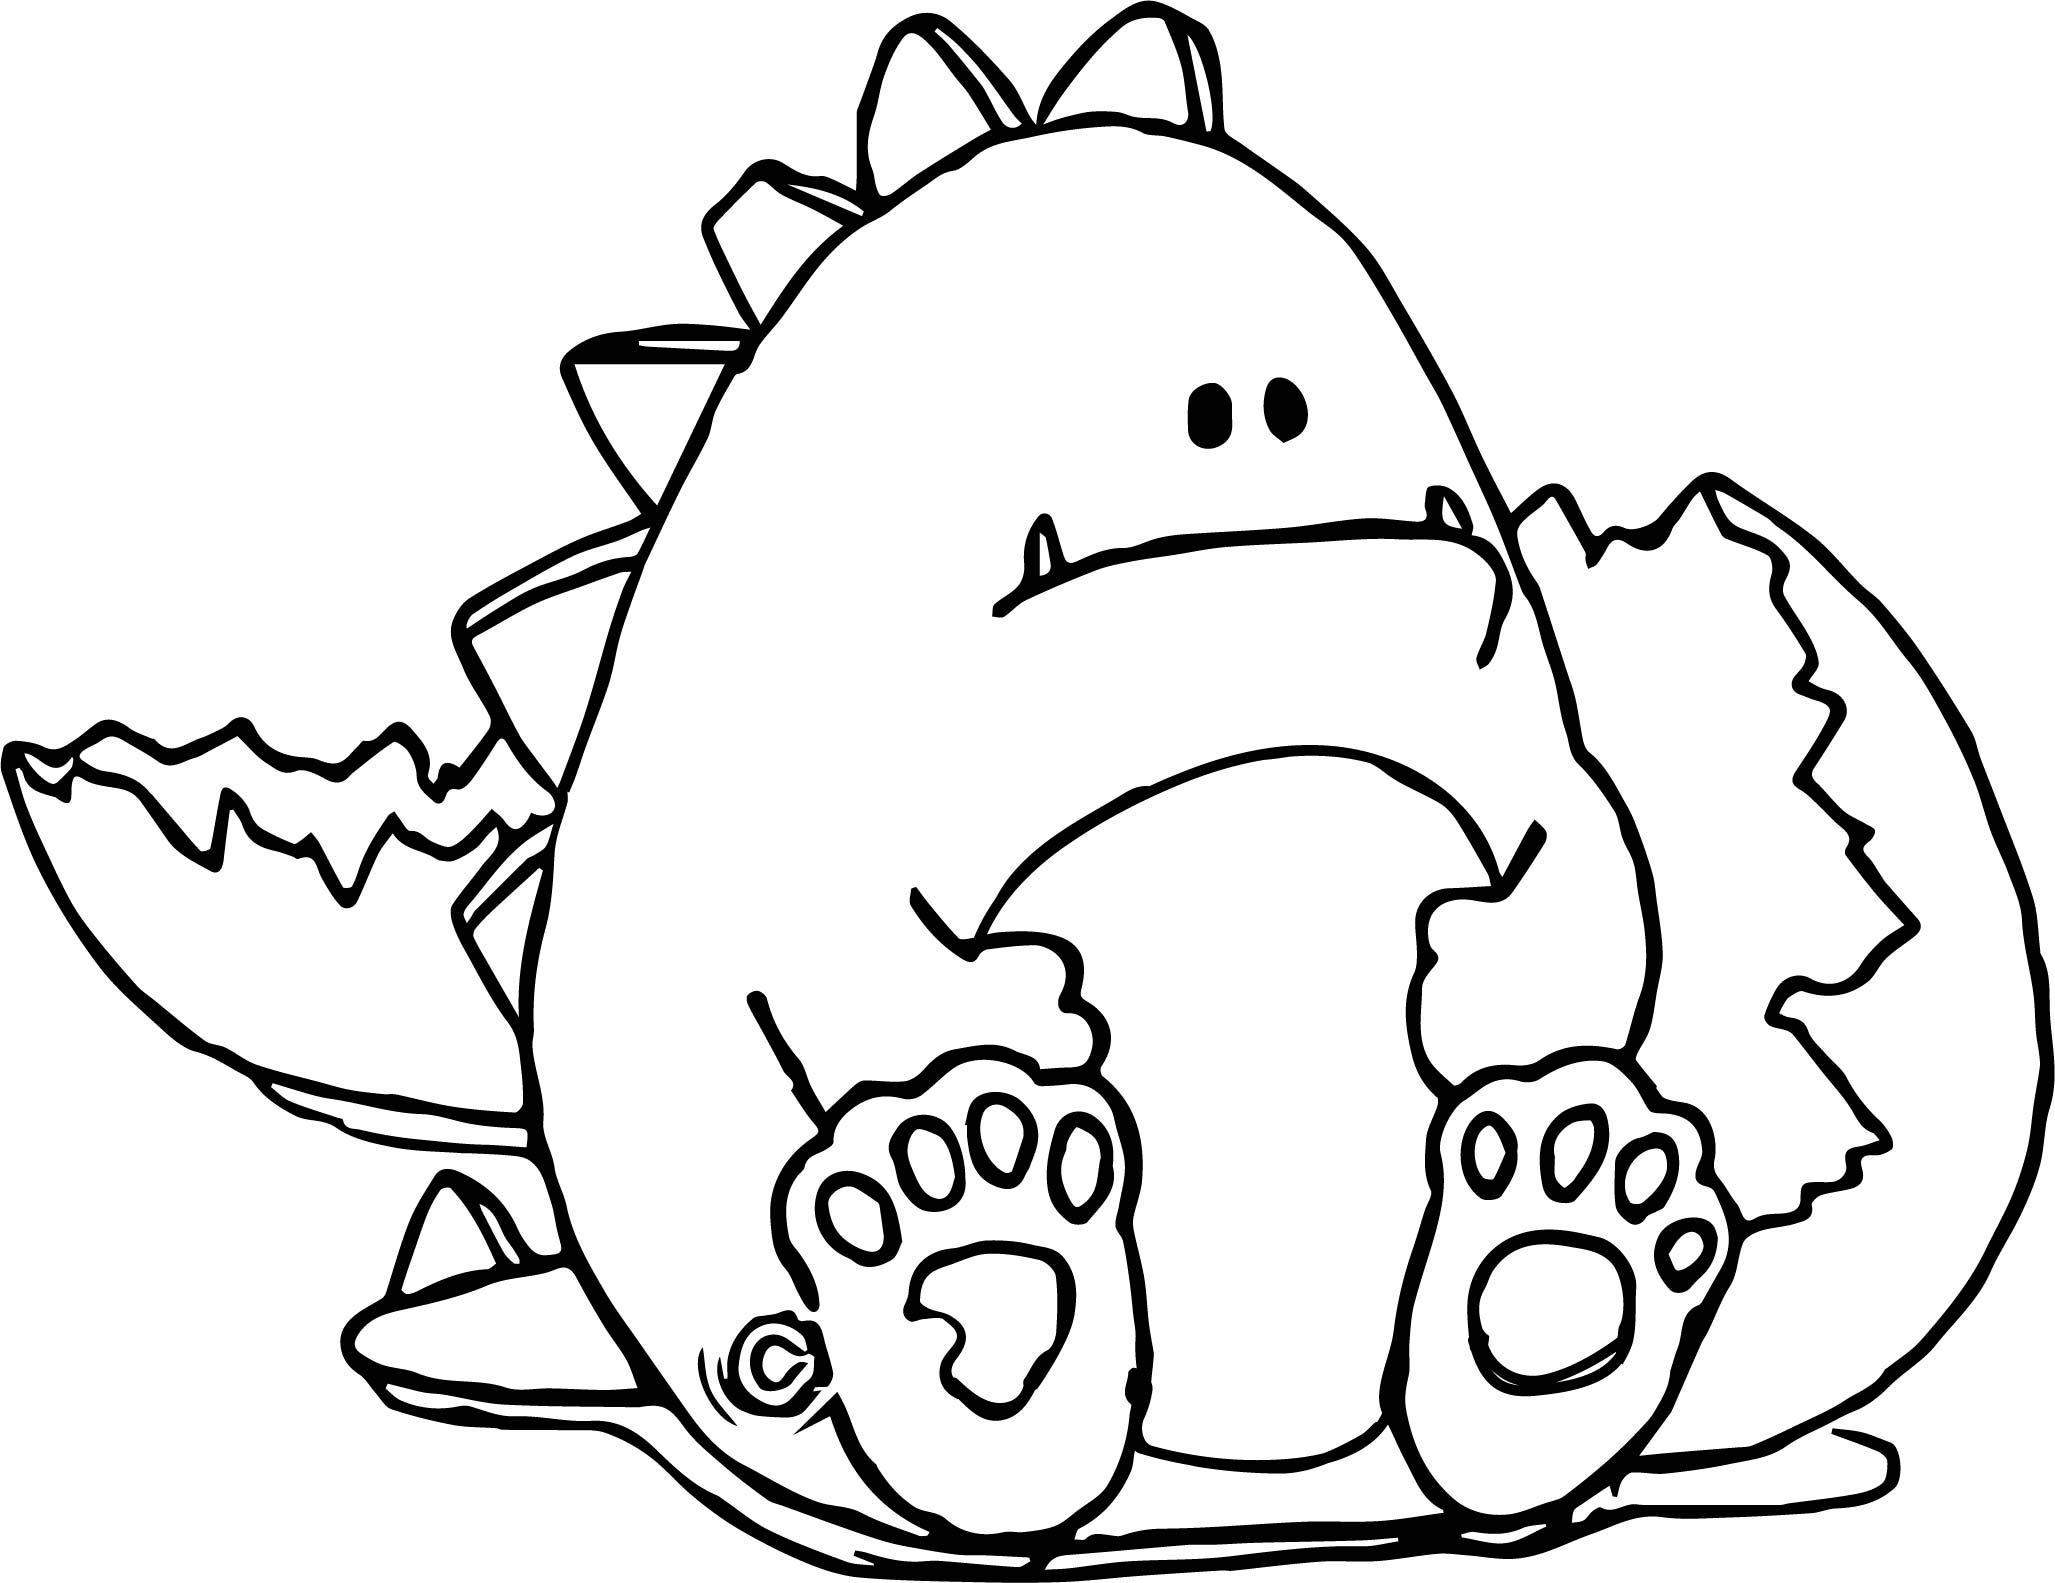 Cool Broken Egg Baby Dinosaur Coloring Page Wecoloringpage